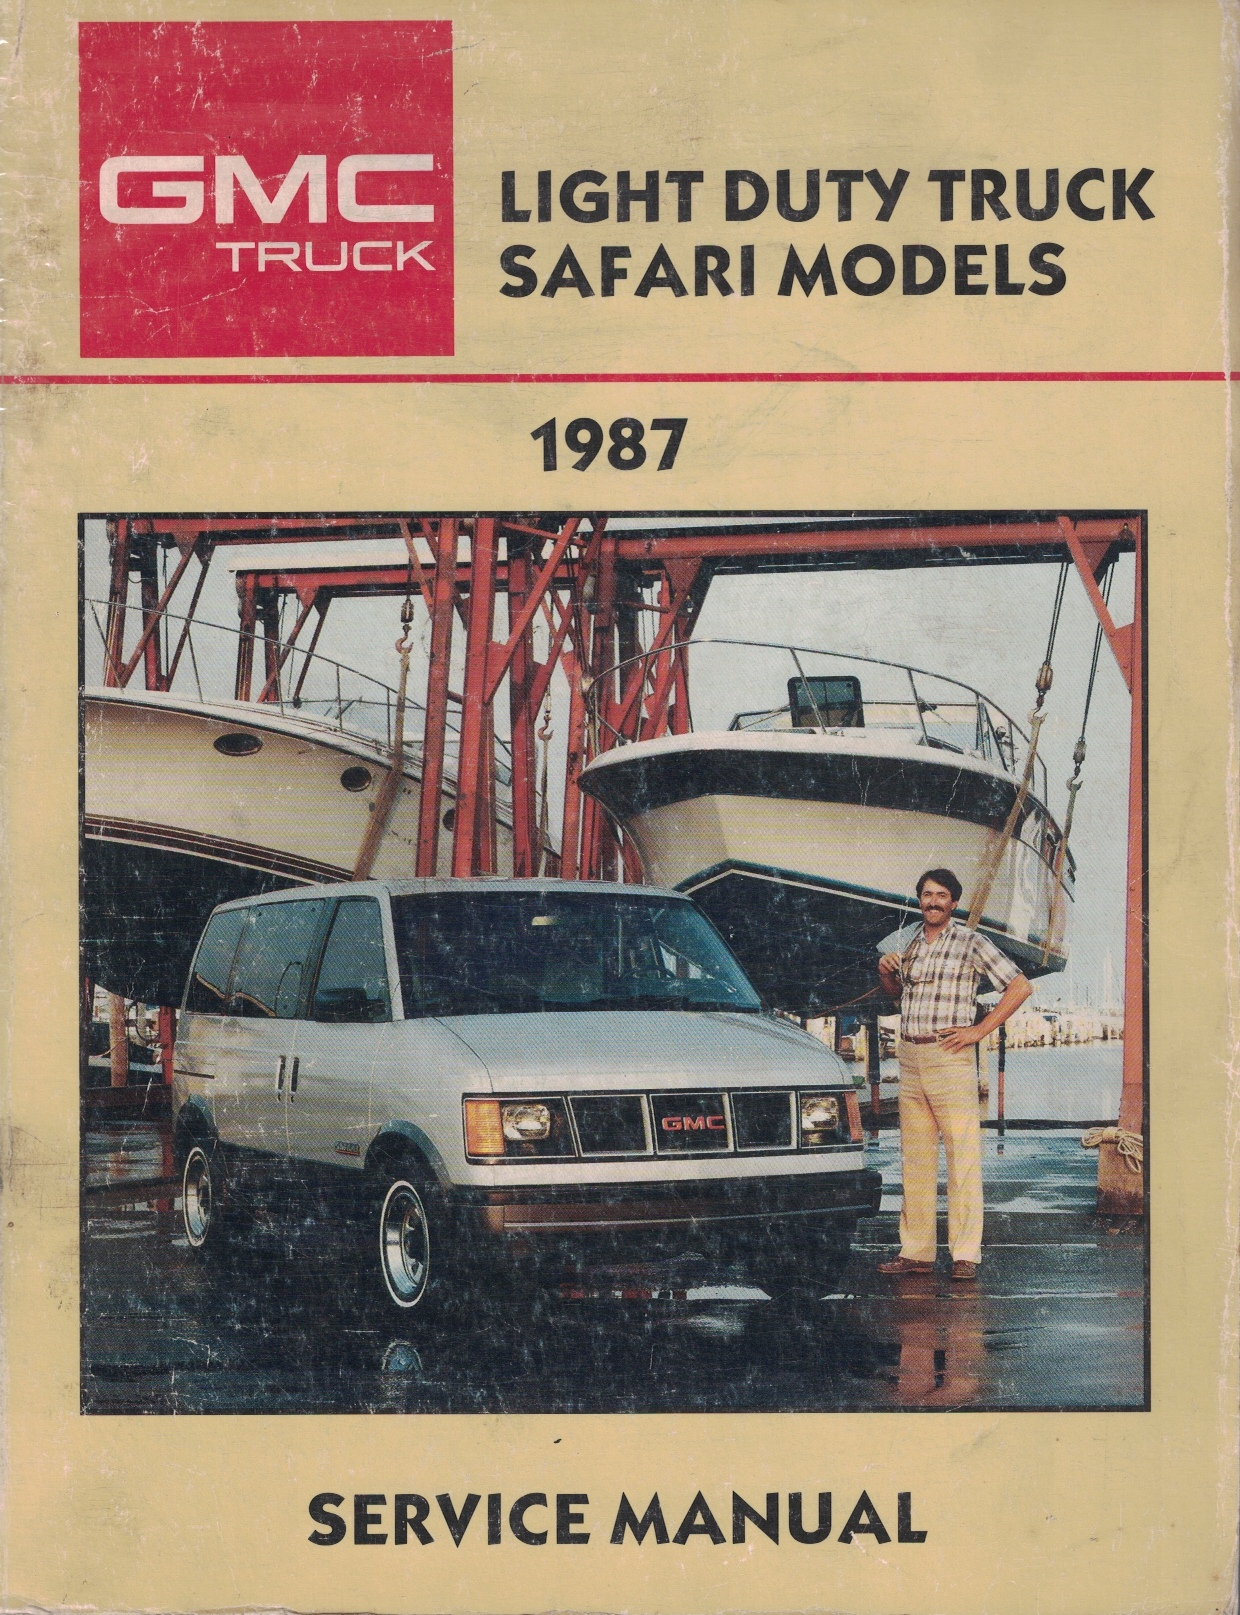 Image for 1987 GMC Light Duty Truck Service Manual: M-Van (Safari) Models [Original Service Manual]